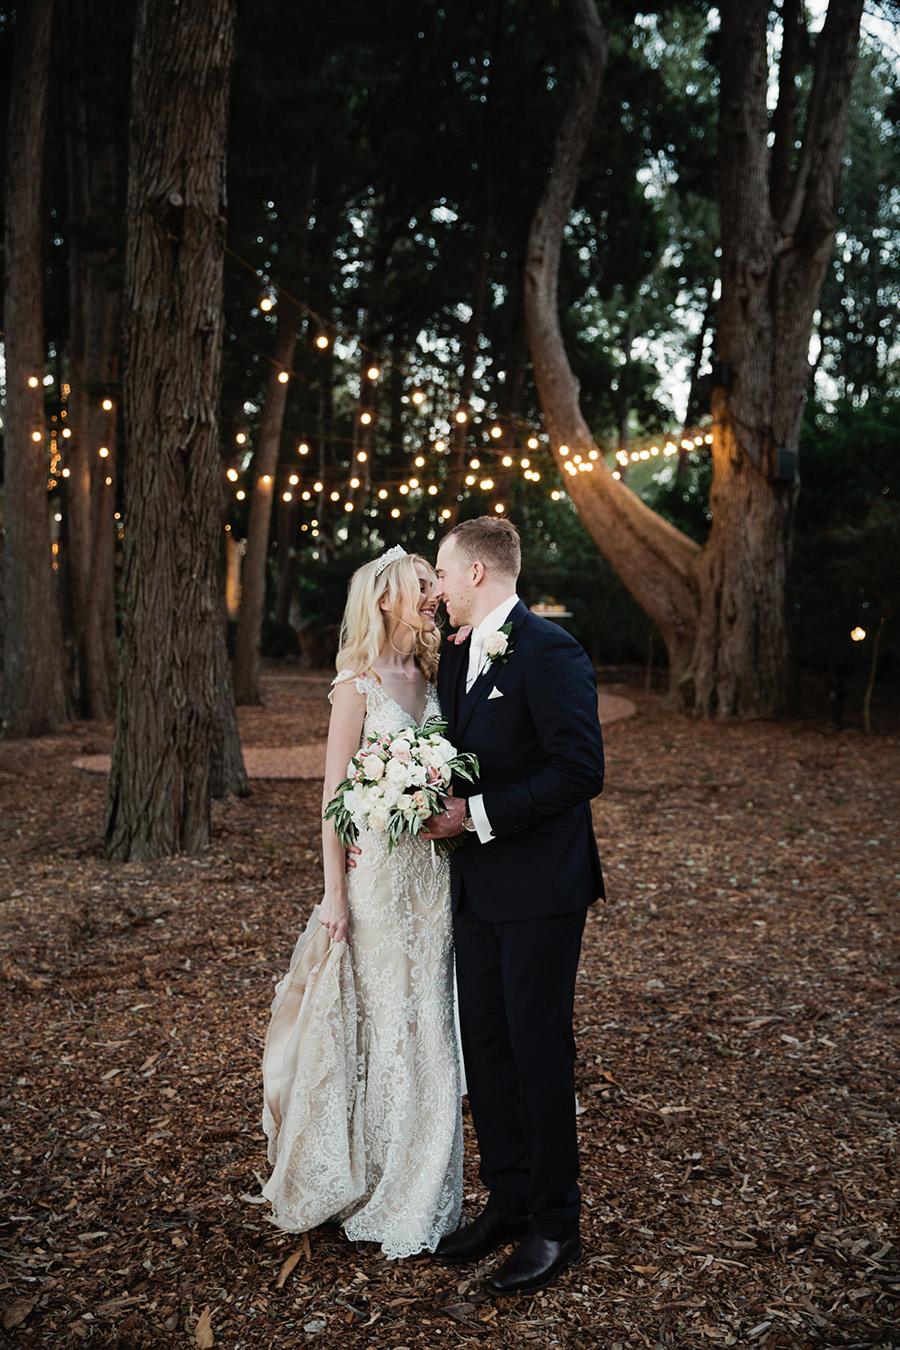 QuinceandMulberryStudios-Gabbinbar- Honest,natural, fun, romantic family-wedding-photography in brisbane queensland